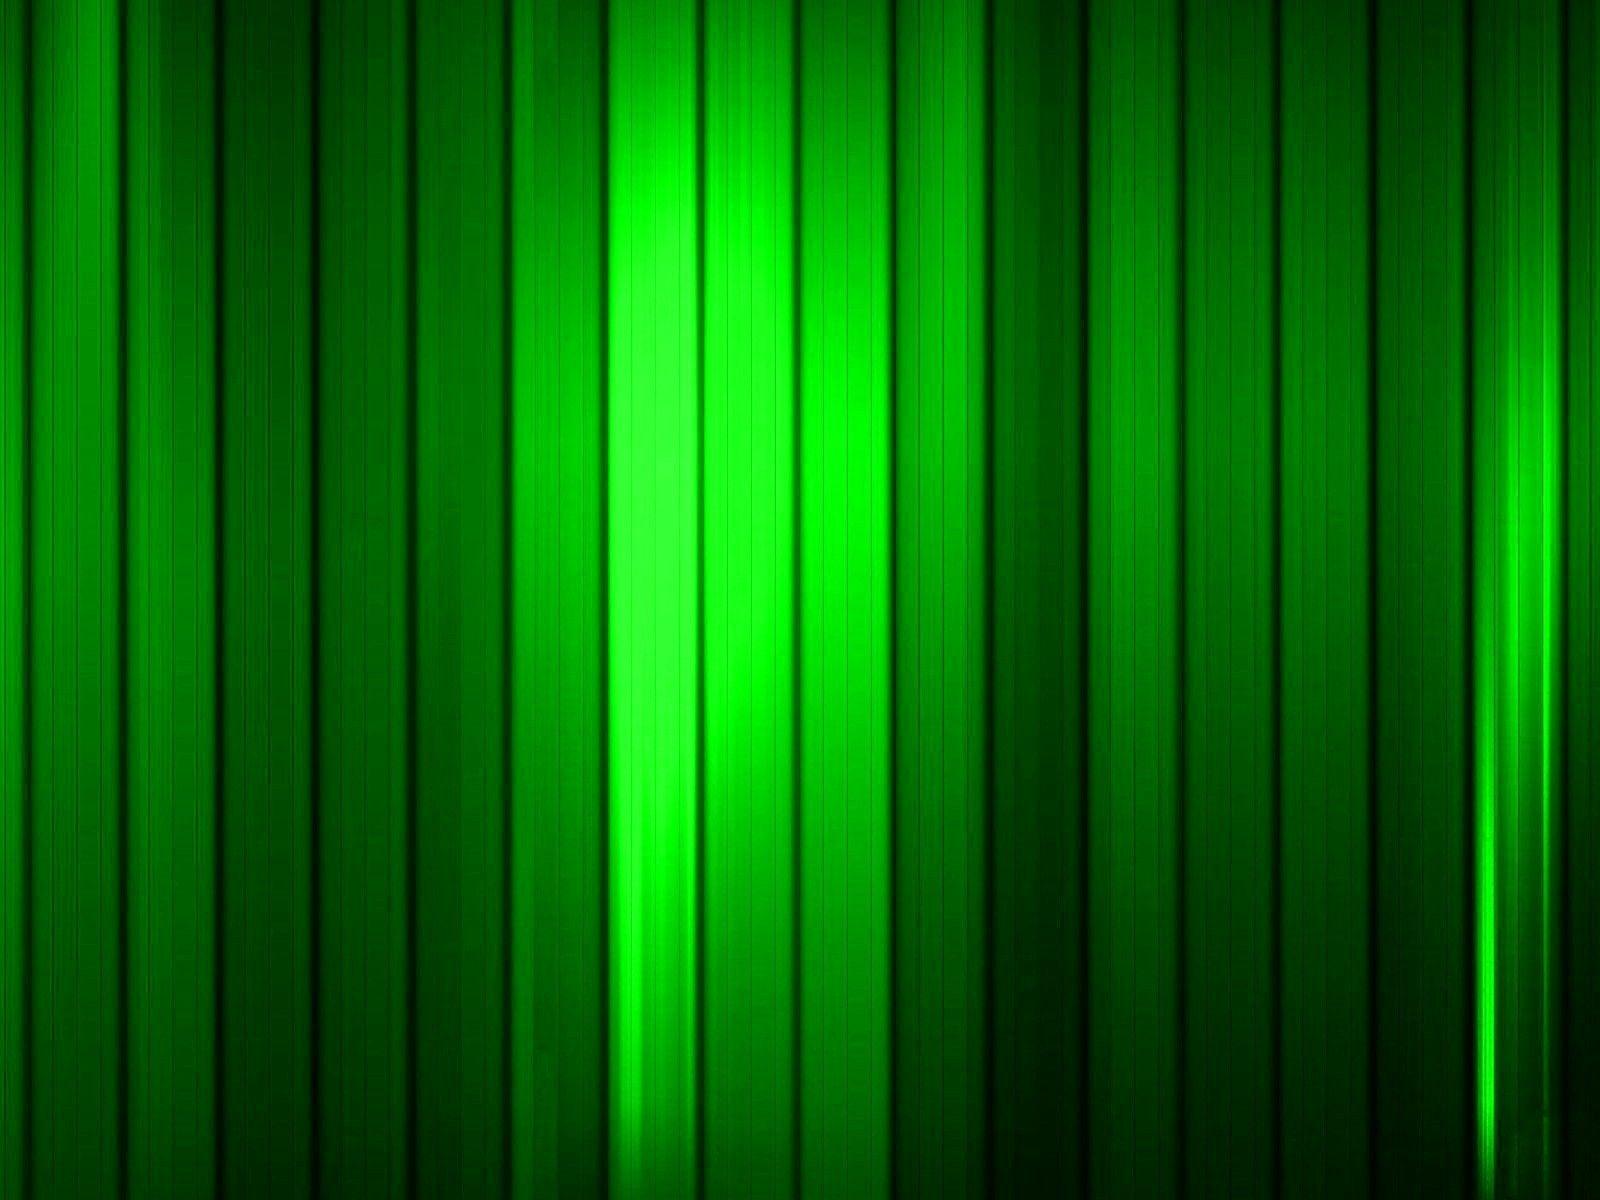 Hd Green Wallpaper